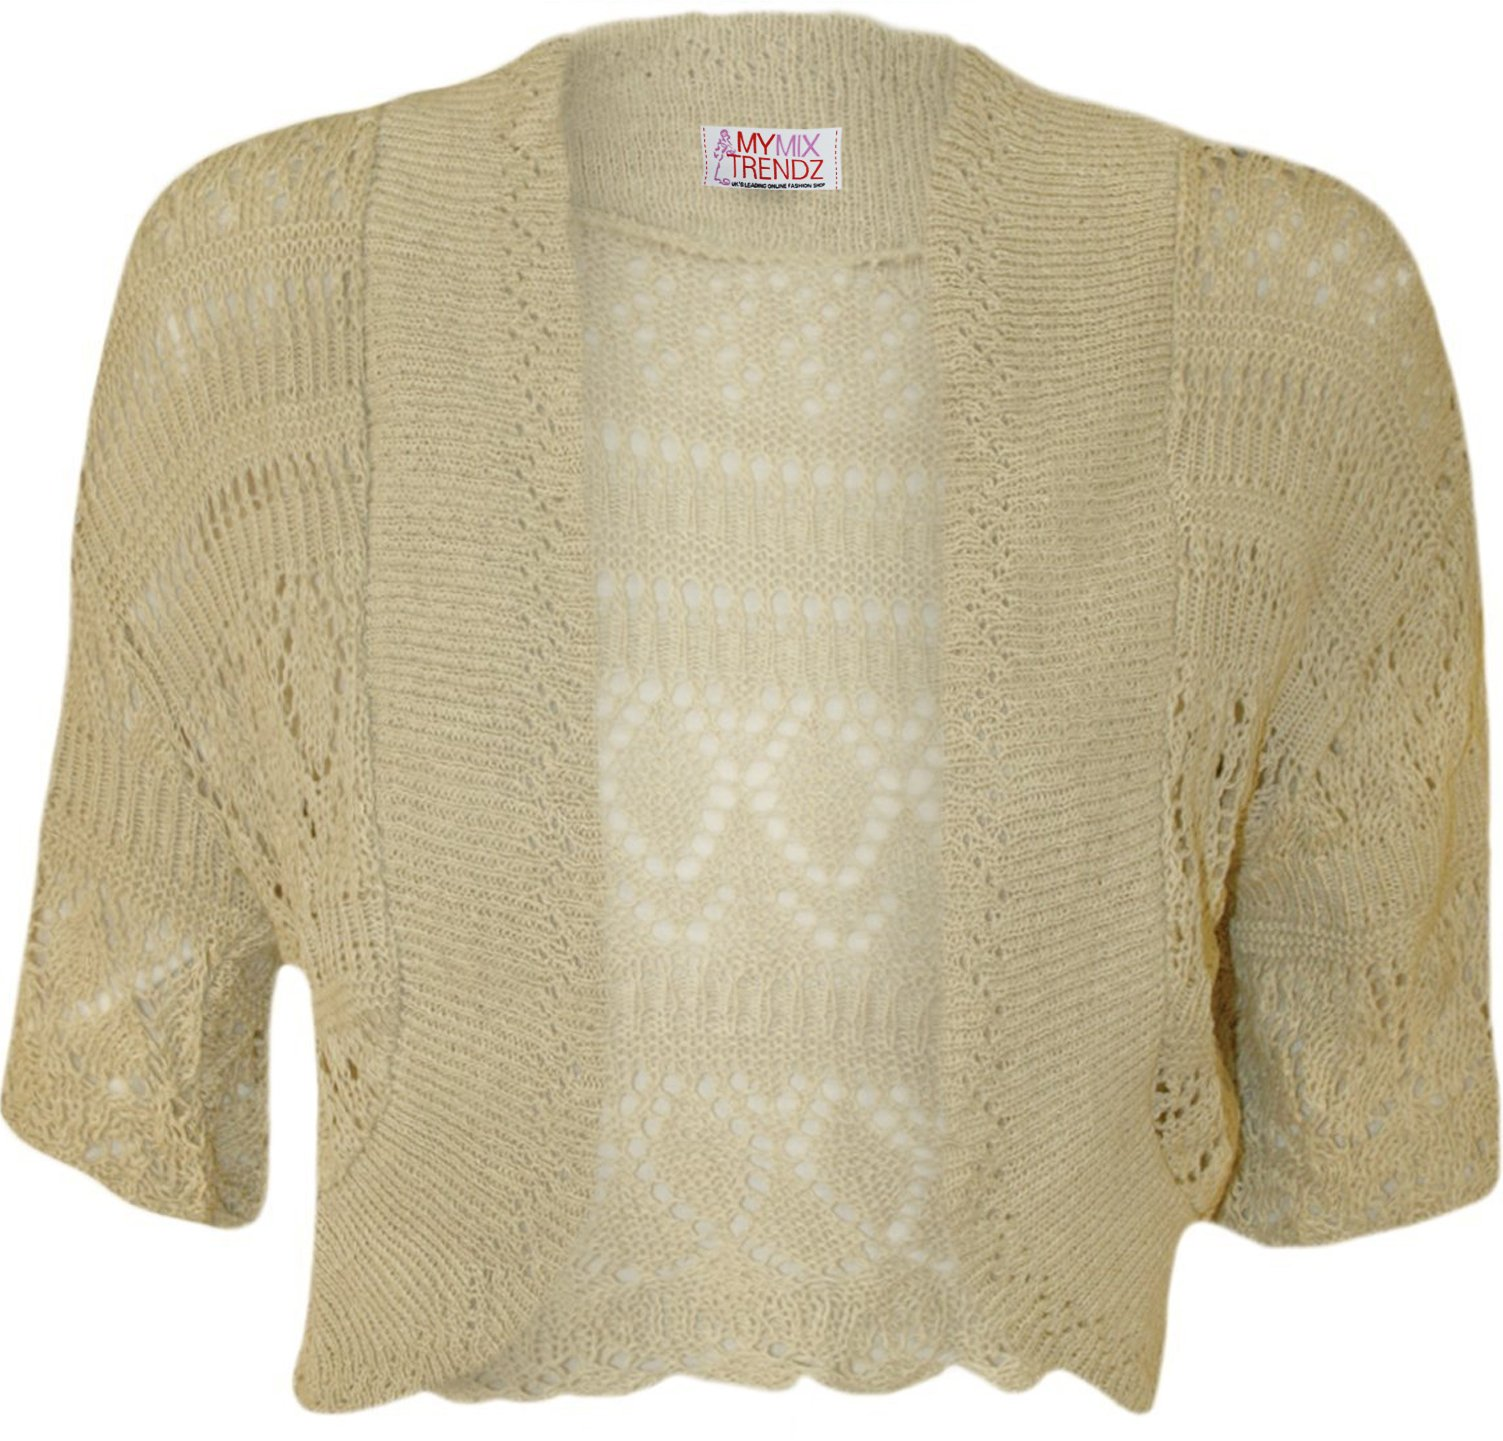 MyMixTrendz - Womens Crochet Knit Midi Sleeve Bolero Shrug (UK 8-12 (EU 36-40 US 4-8), Beige)